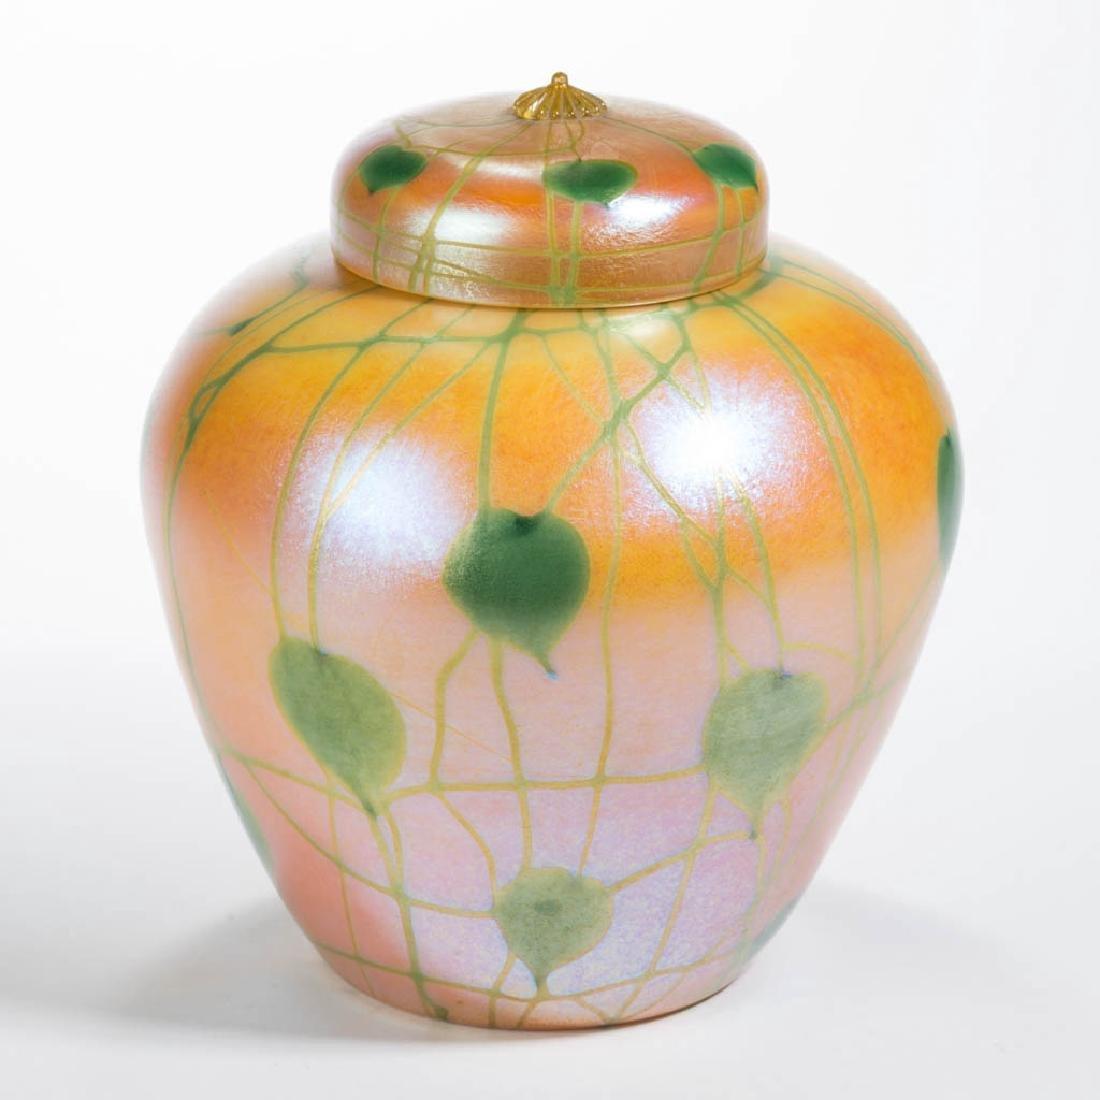 DURAND HEART AND VINE ART GLASS GINGER JAR